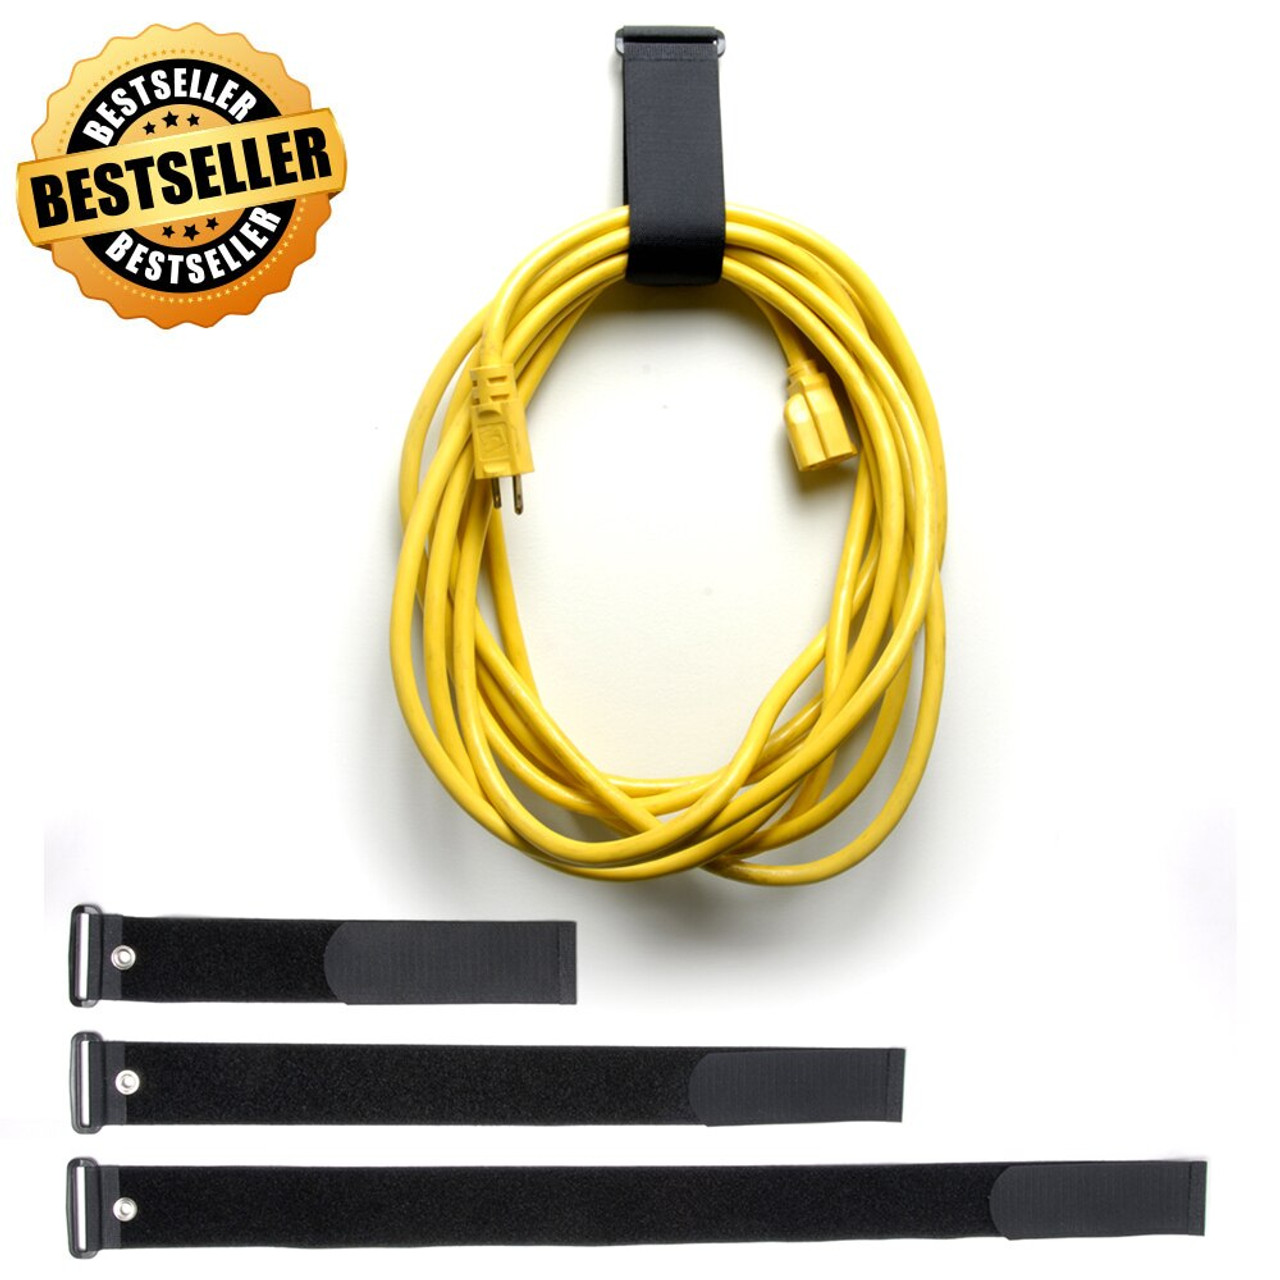 VELCRO ® Brand Straps - VELSTRAP® with Grommet / Velcro Straps - Bundling Straps - Velcro Tie - Velcro Strap